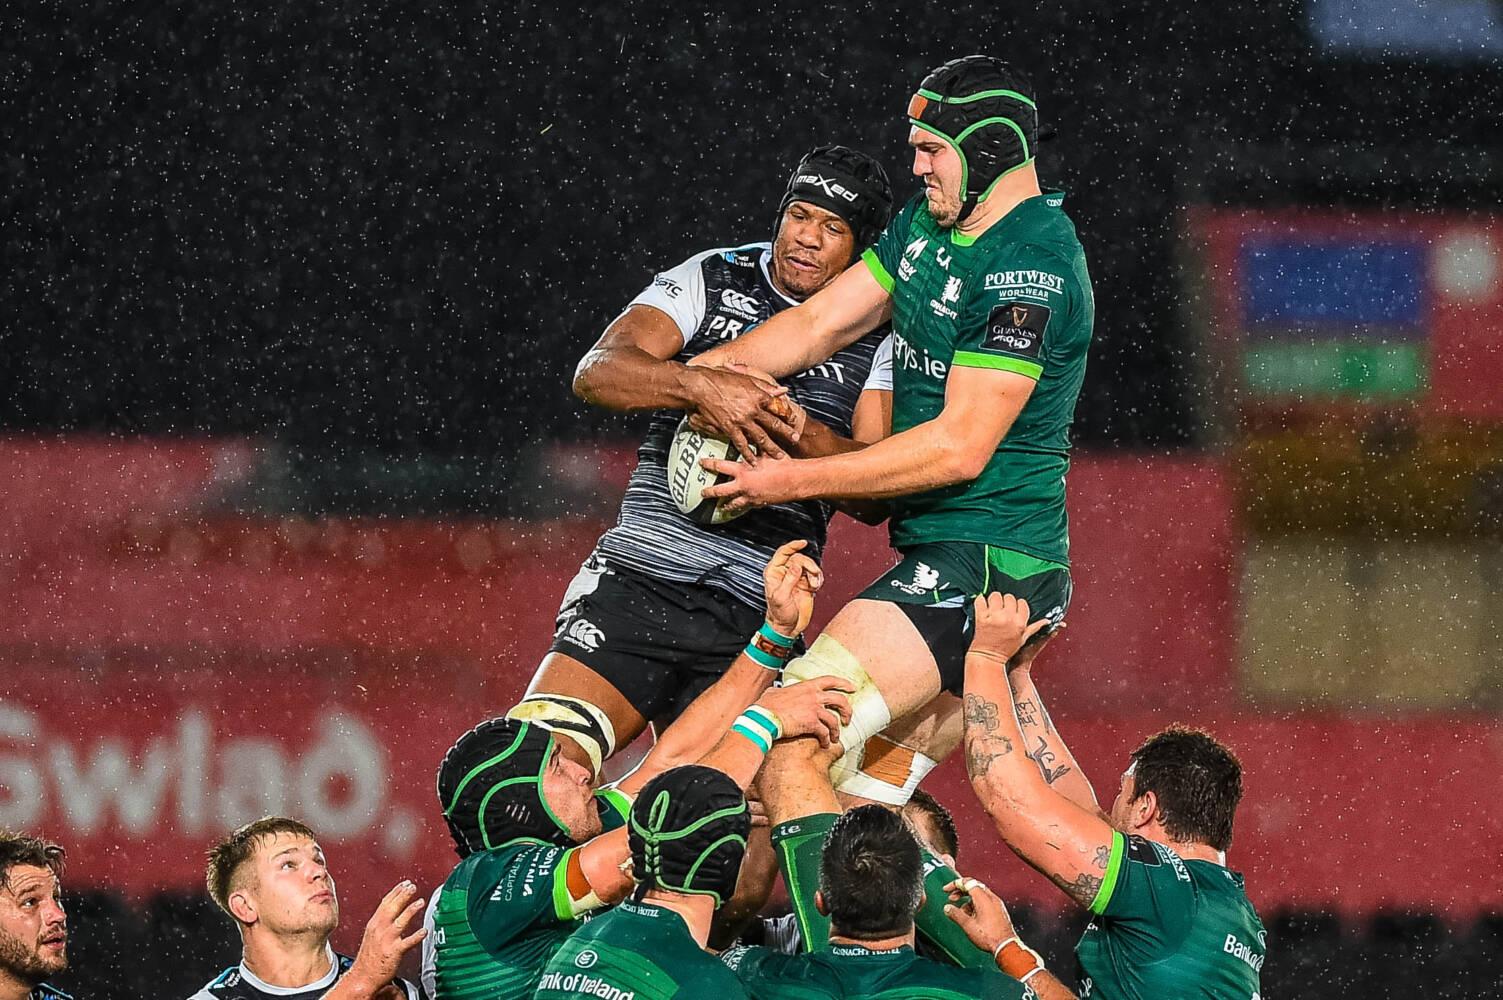 Dragons sign Welsh-qualified lock Maksymiw